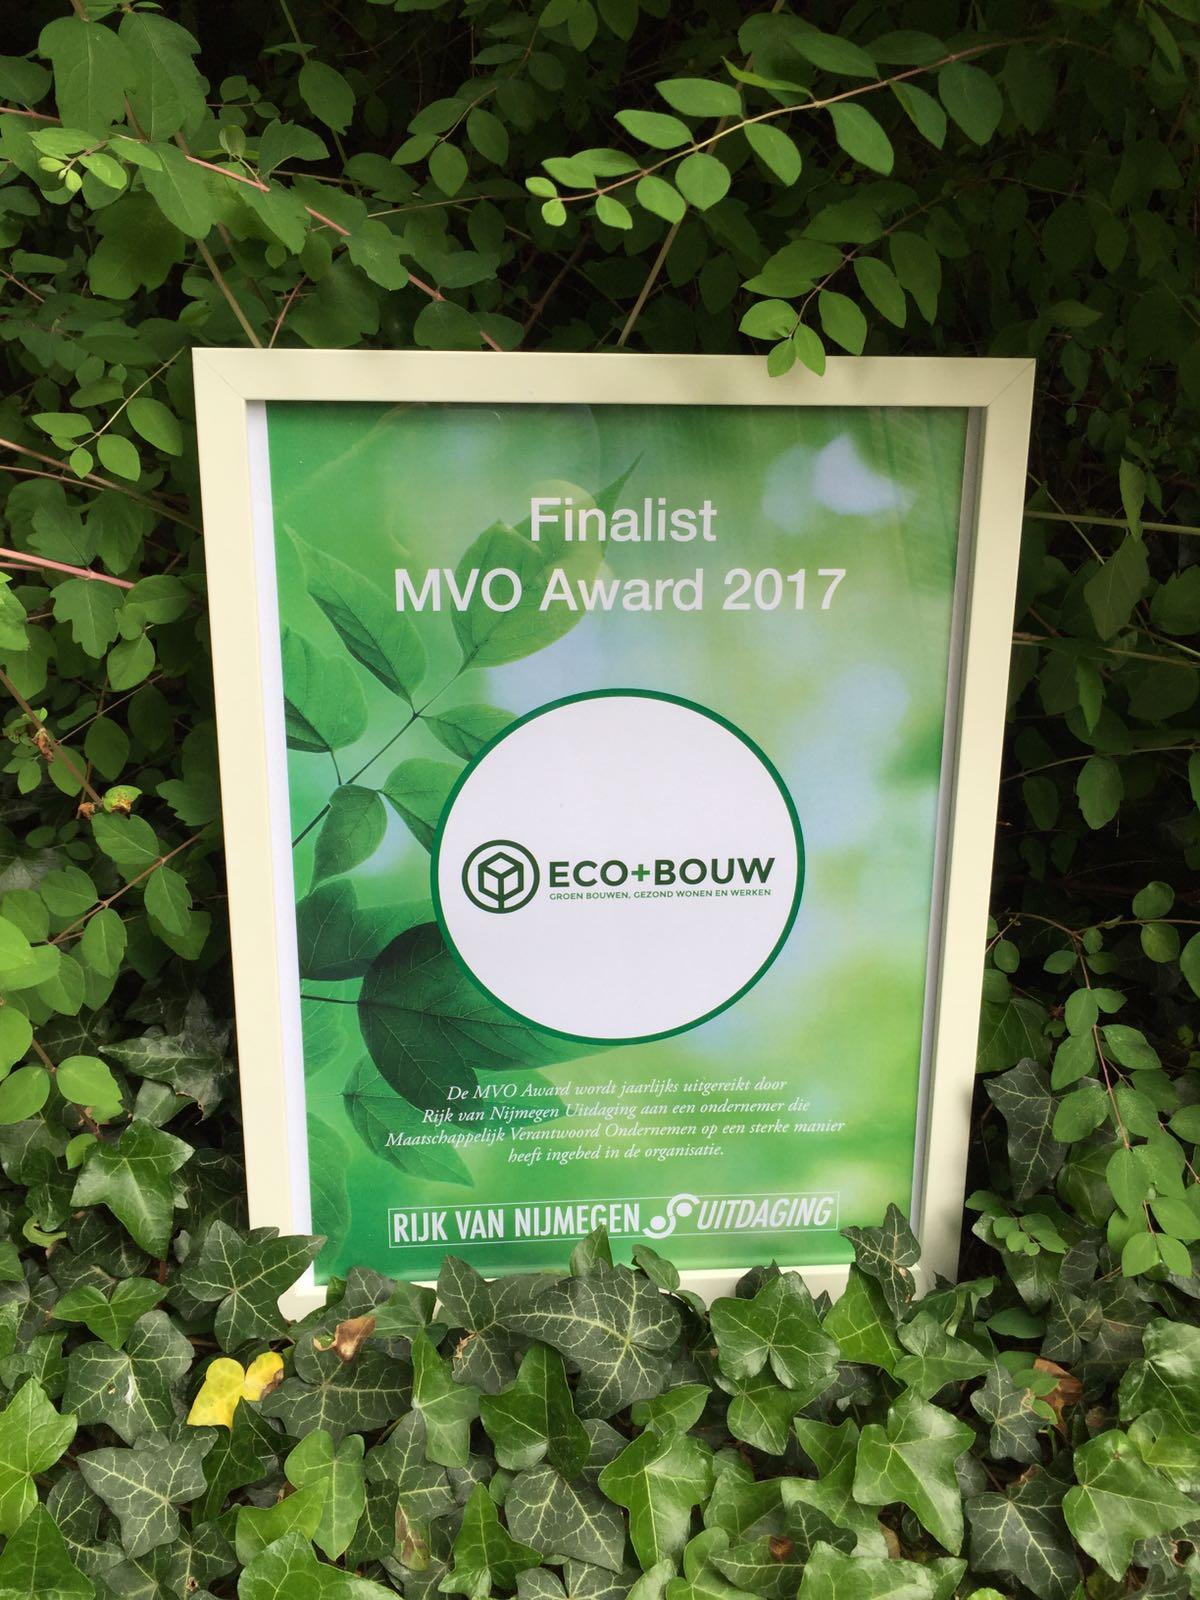 Eco+Bouw MVO award 2